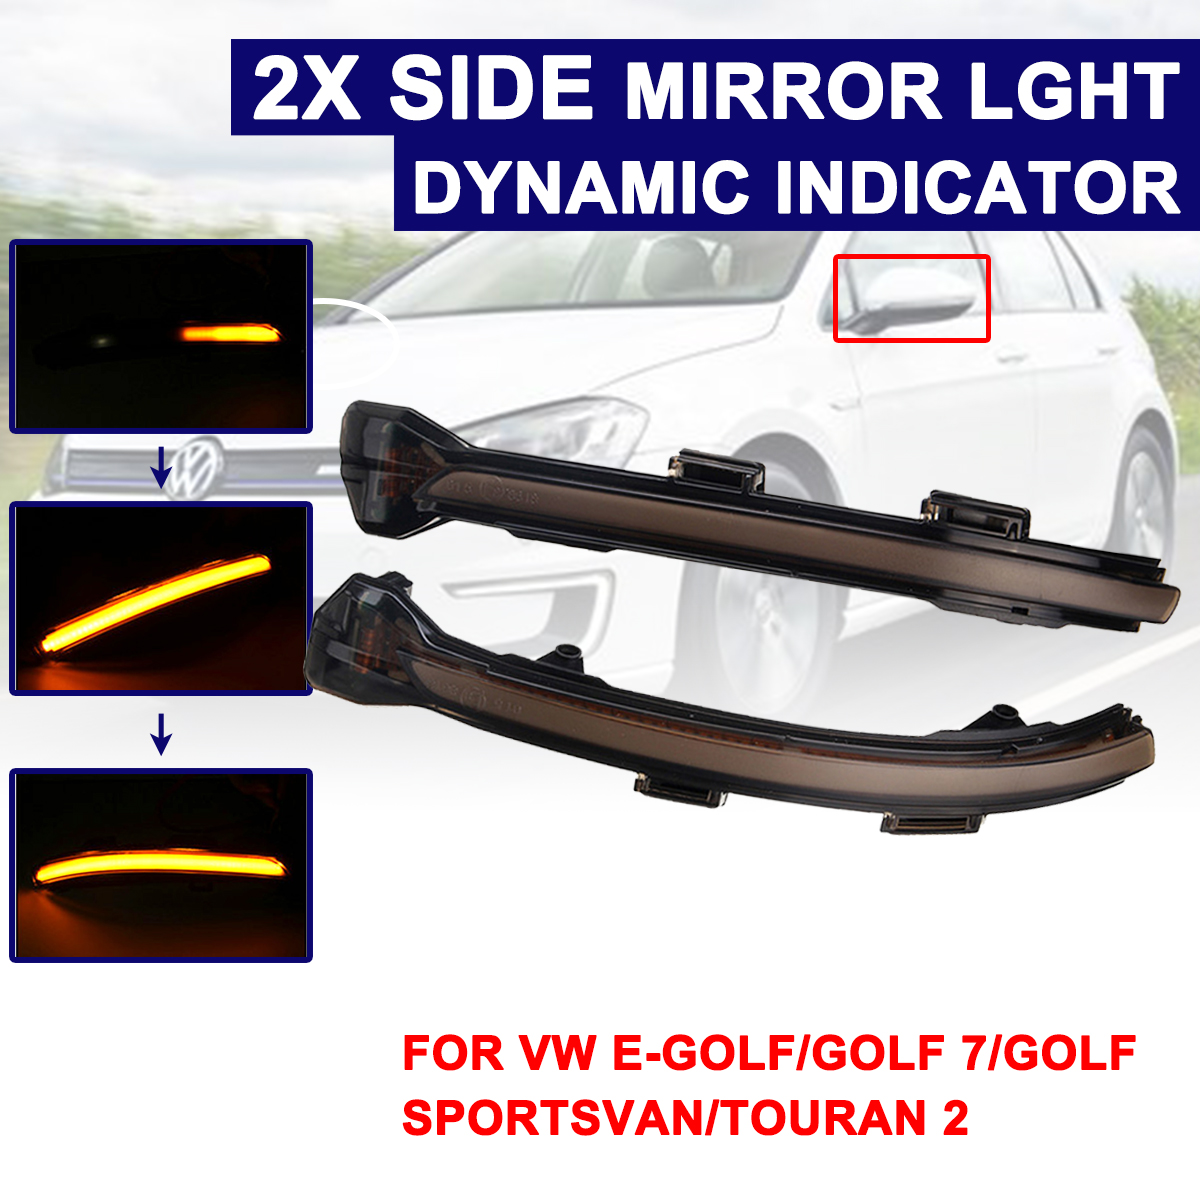 Highlight LED Car Dynamic Turn Light Rearview Mirror Signal Lamp For Volkswagen Golf 7 MK7 2013+ For VW Touran 2016+